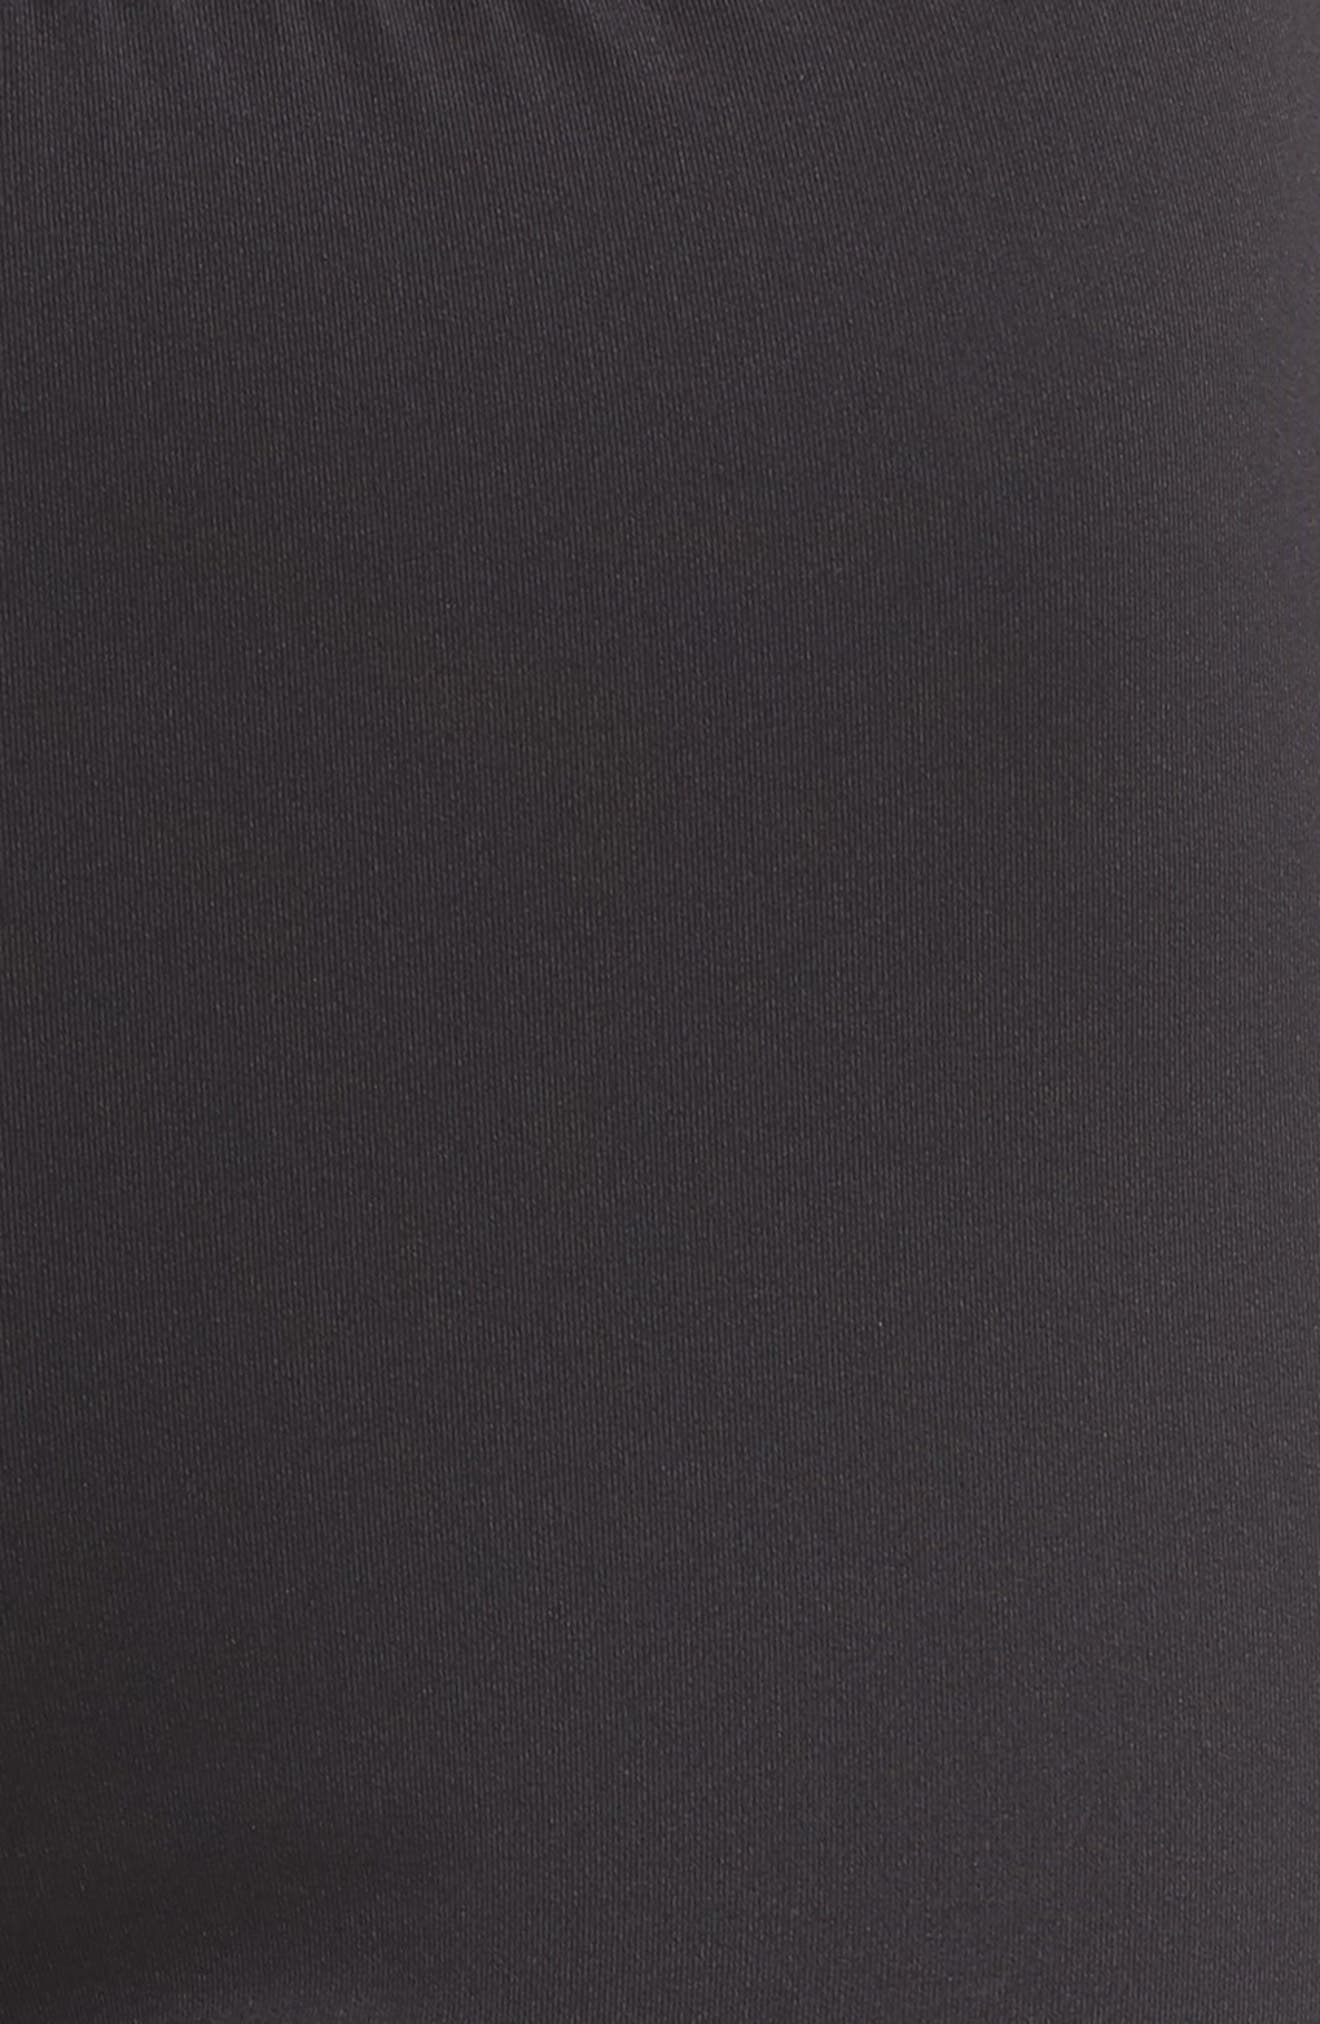 Banda Leggings,                             Alternate thumbnail 6, color,                             Black/ White